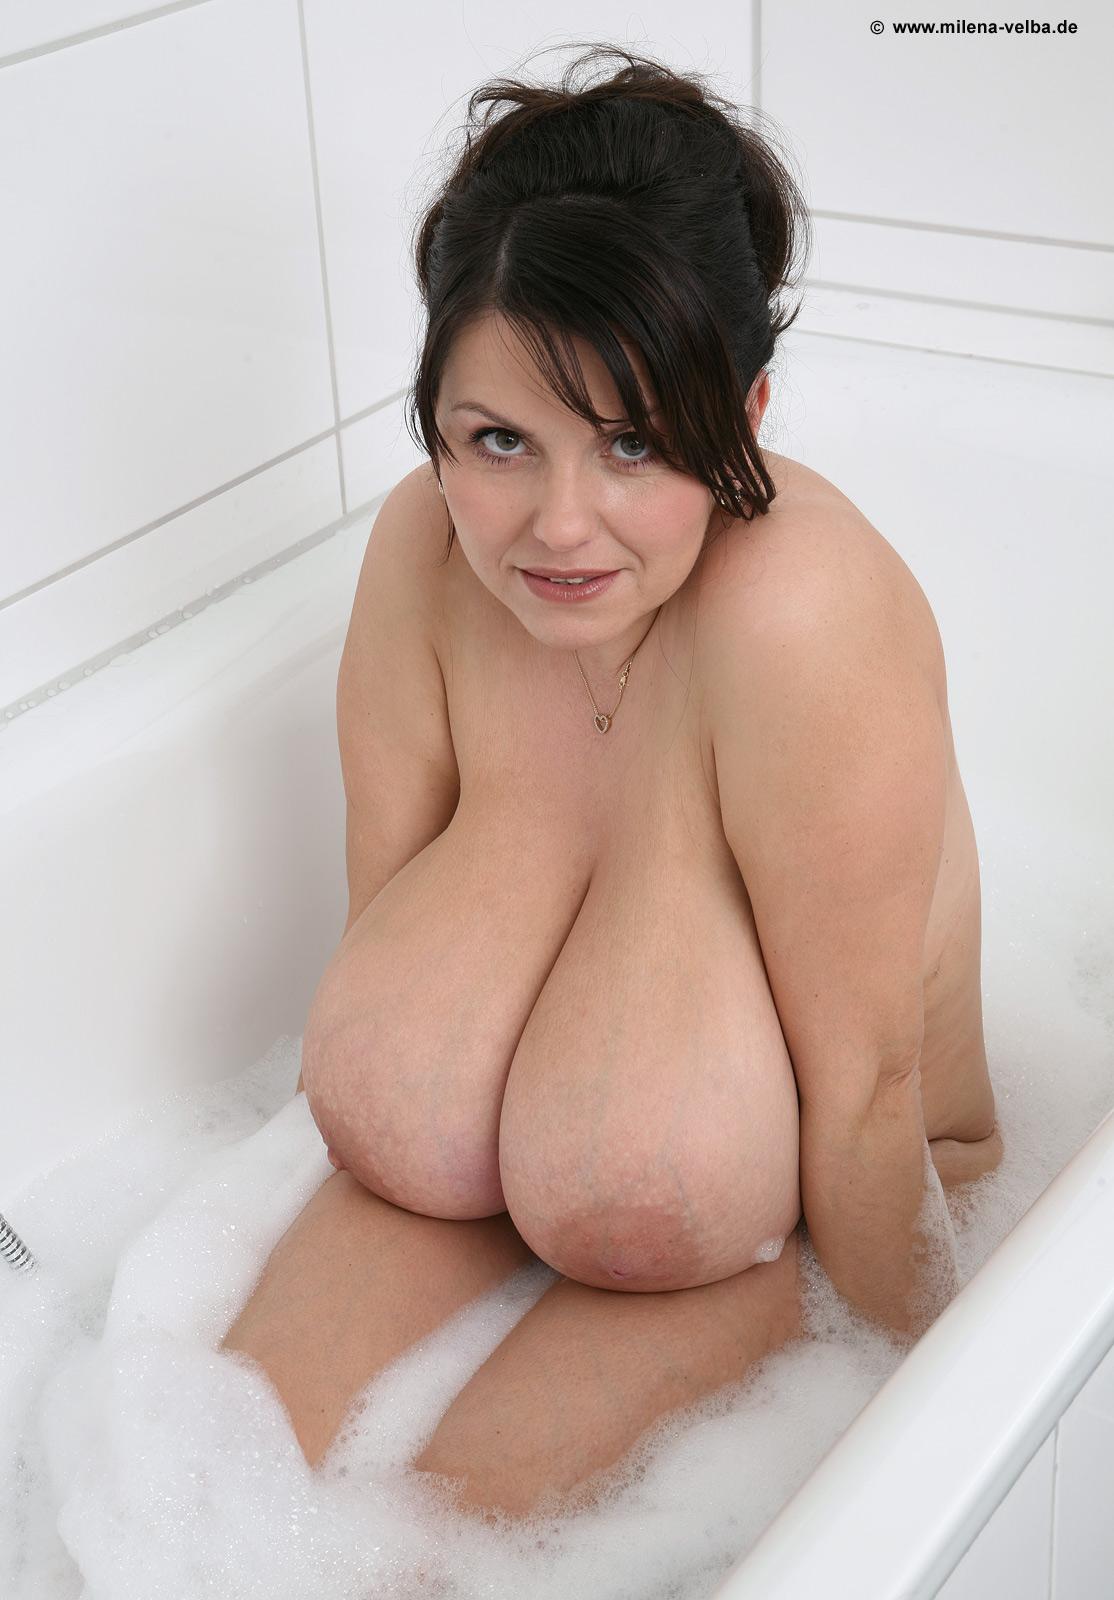 M Velba: New Bath